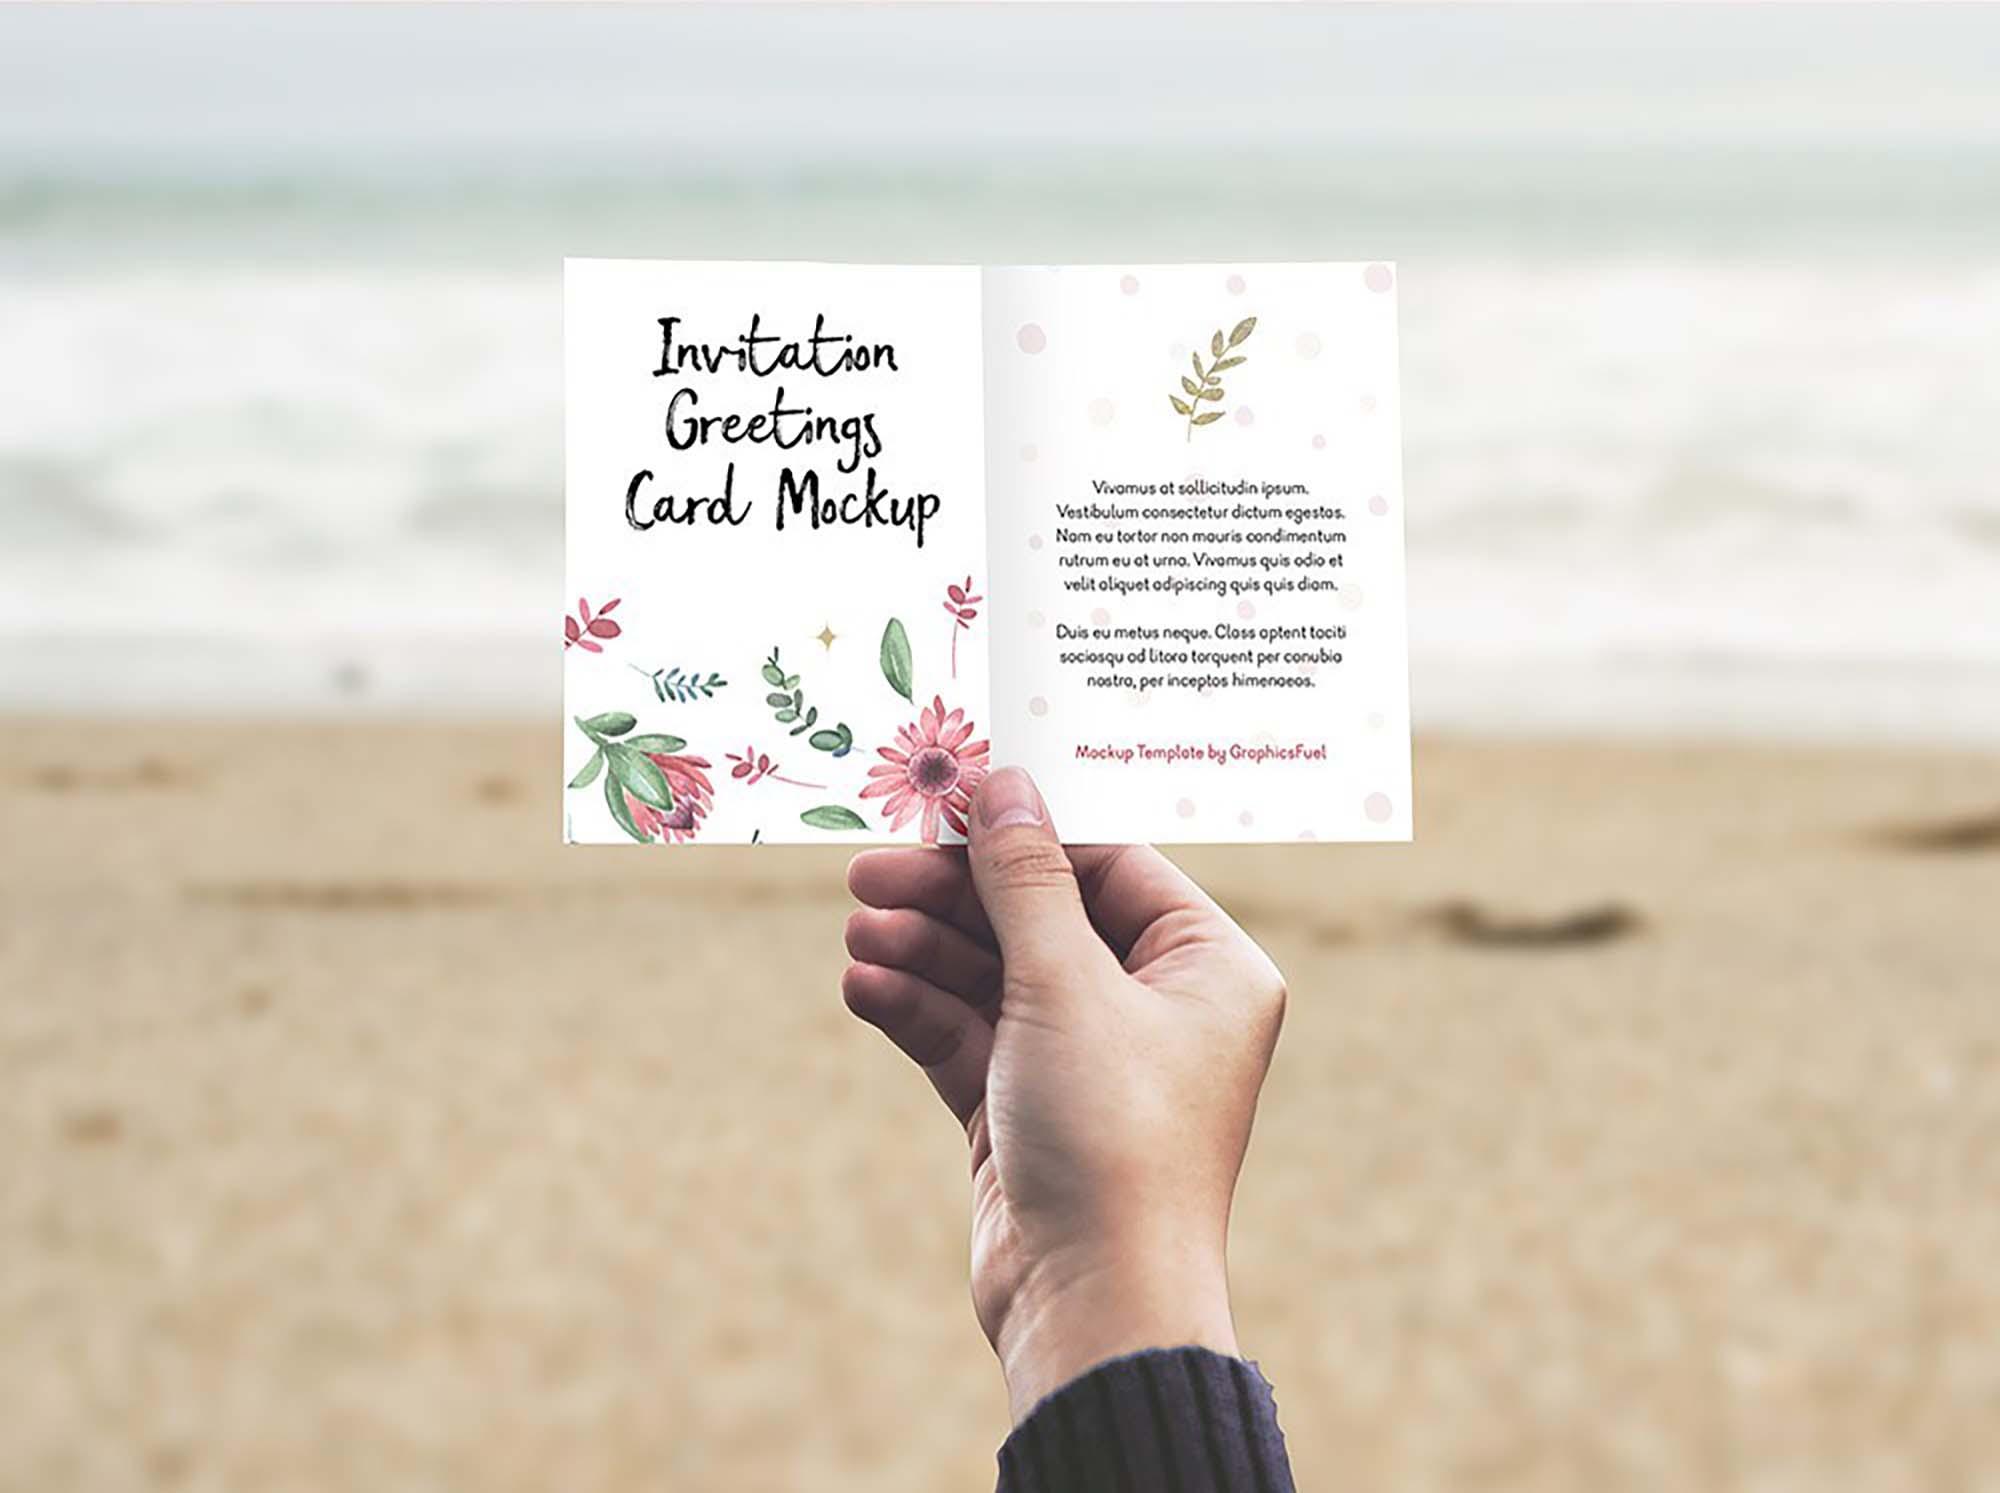 Invitation Card in Hand Mockup